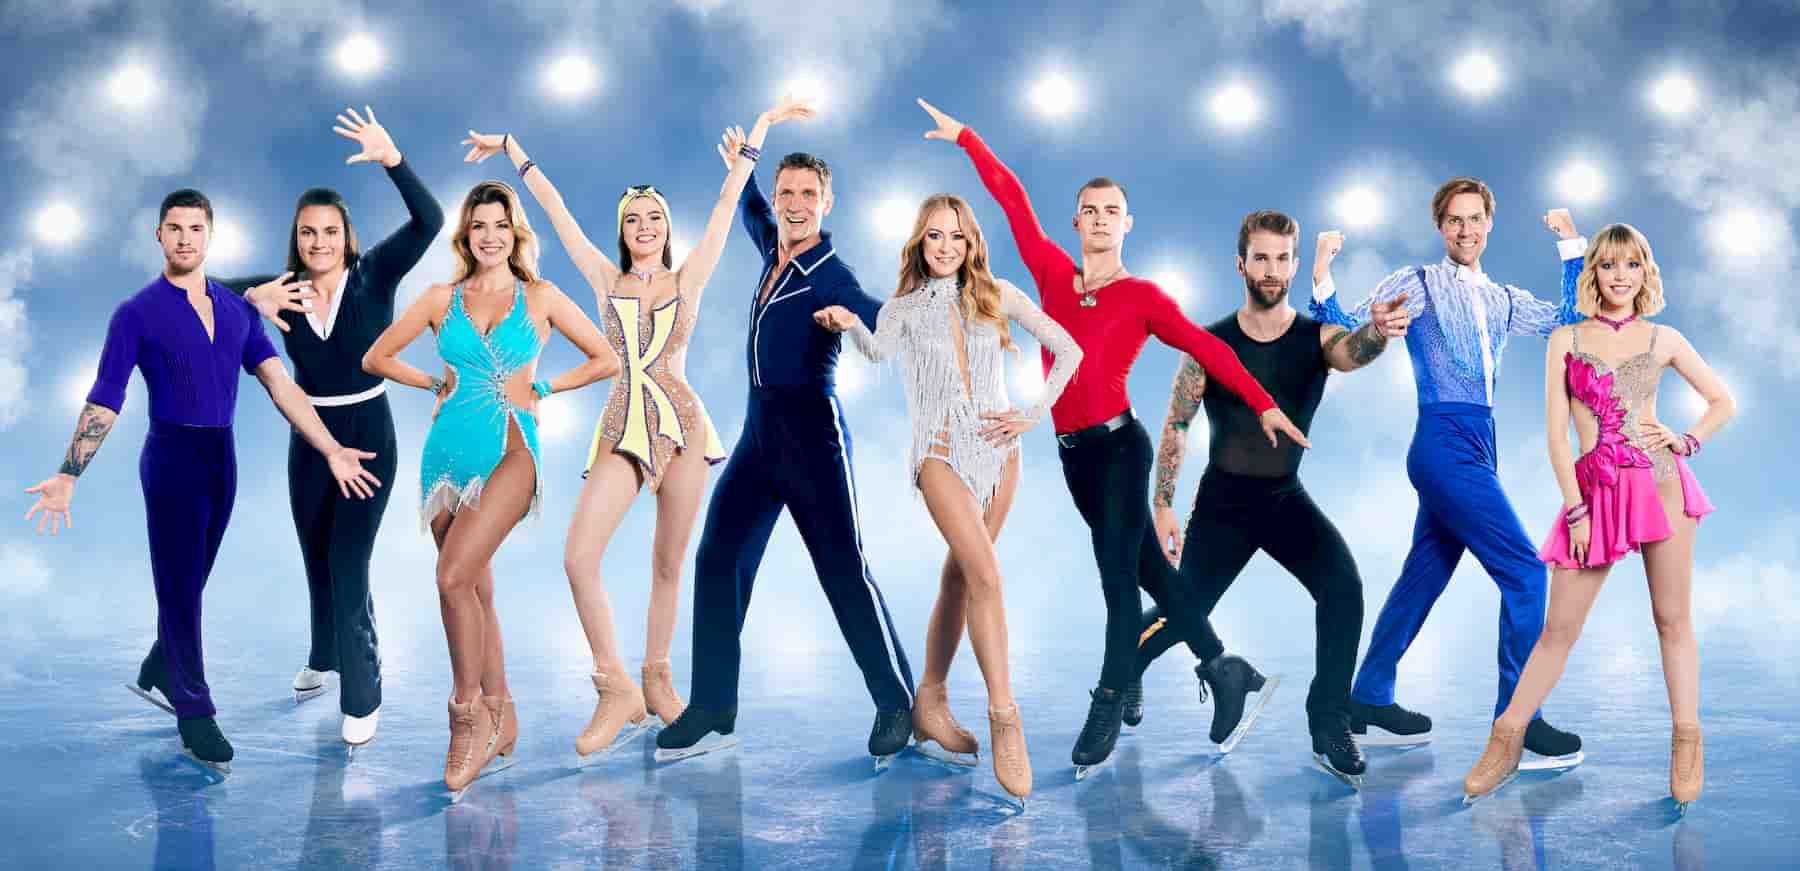 Alle Promi-Kandidaten Dancing On Ice 2019 2te Staffel